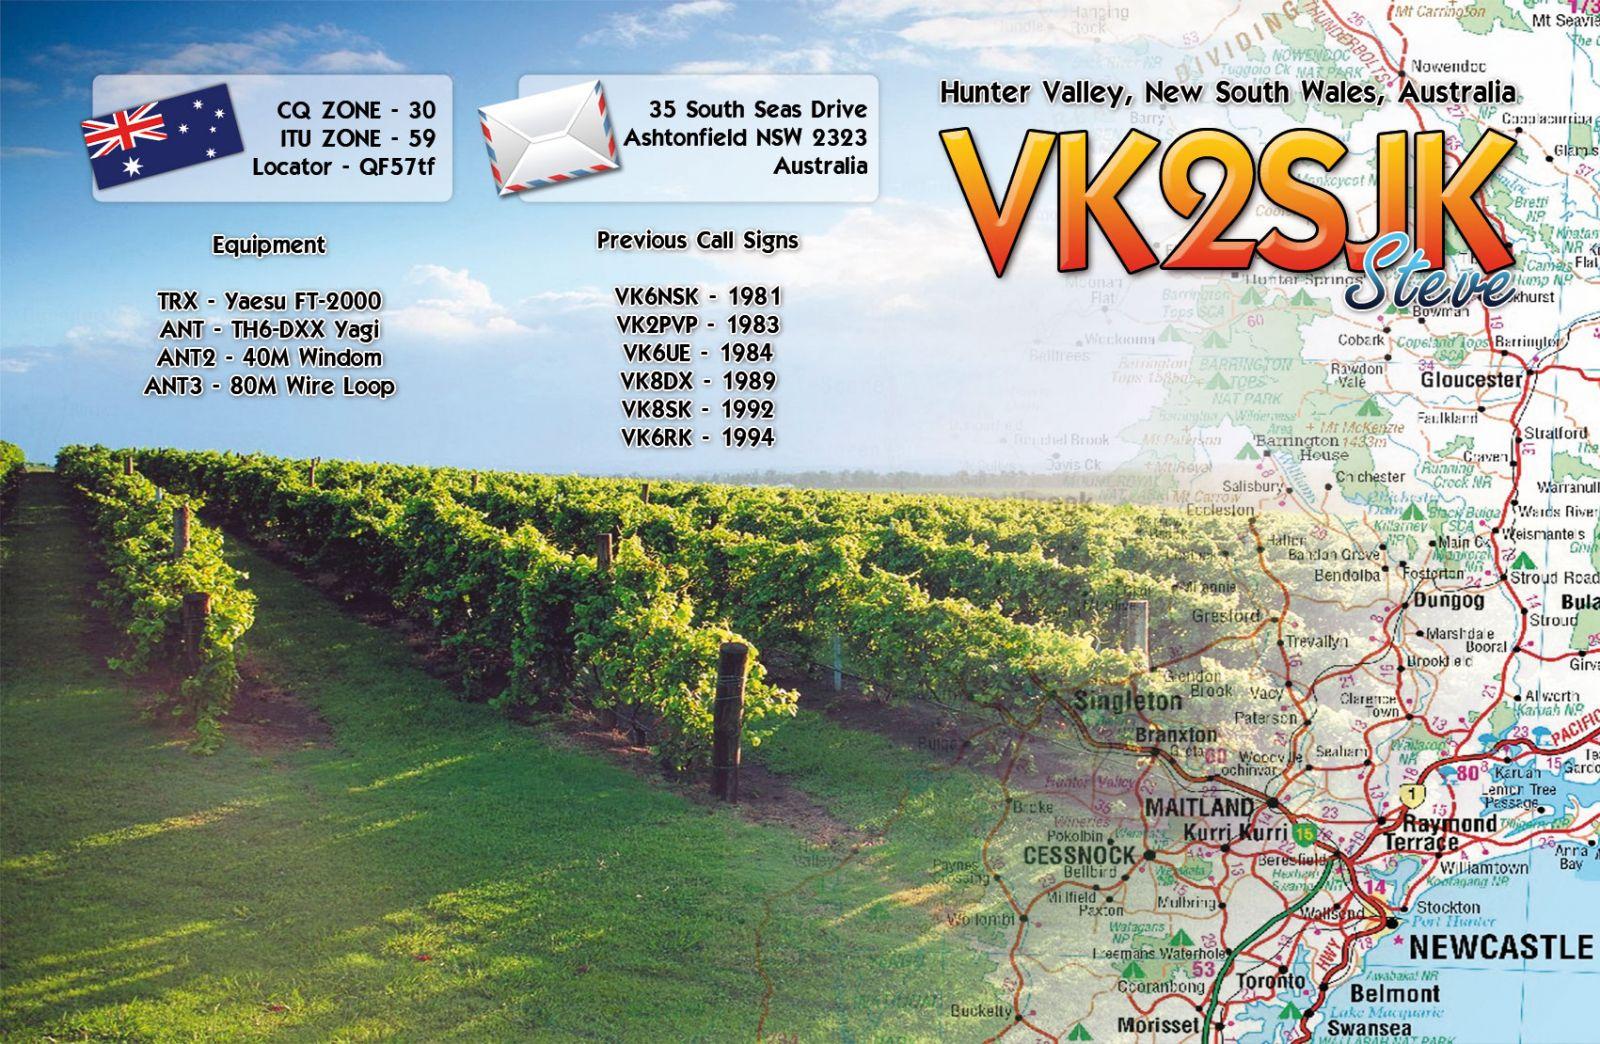 QSL image for VK2SJK